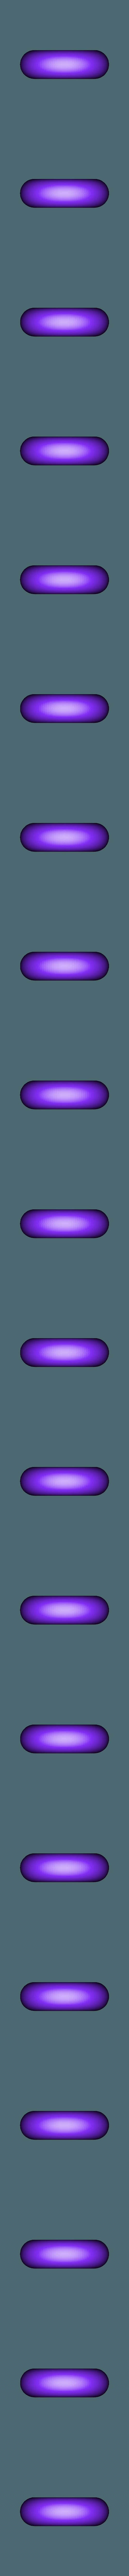 donut.stl Download free STL file 2 Color Donut • 3D printing design, filamentone